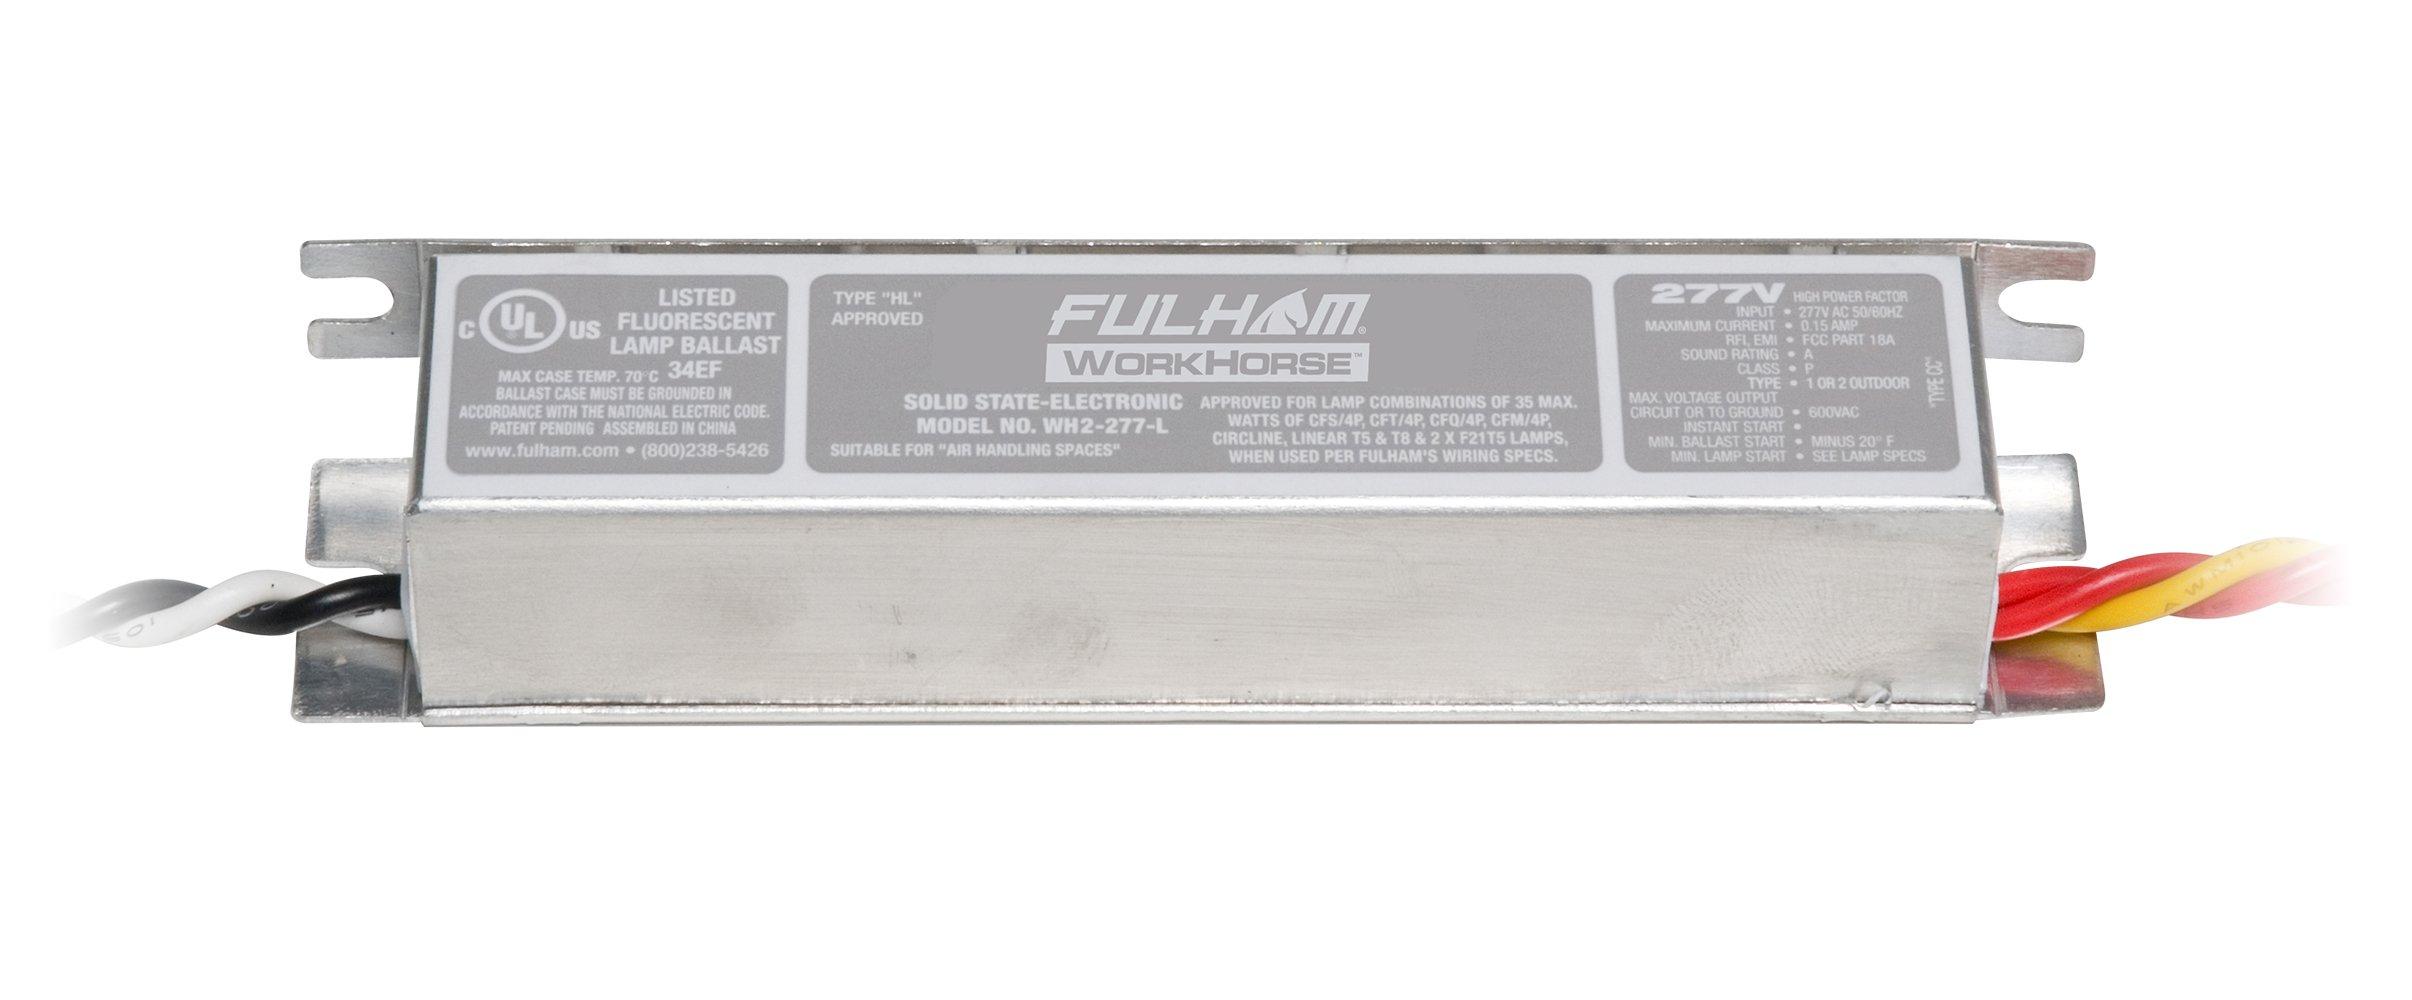 Fulham WH2-277-L Racehorse2 Ballast, Cfl, 2-Lamp, T5 T8 F21T15 CFS CFT, 120/277V